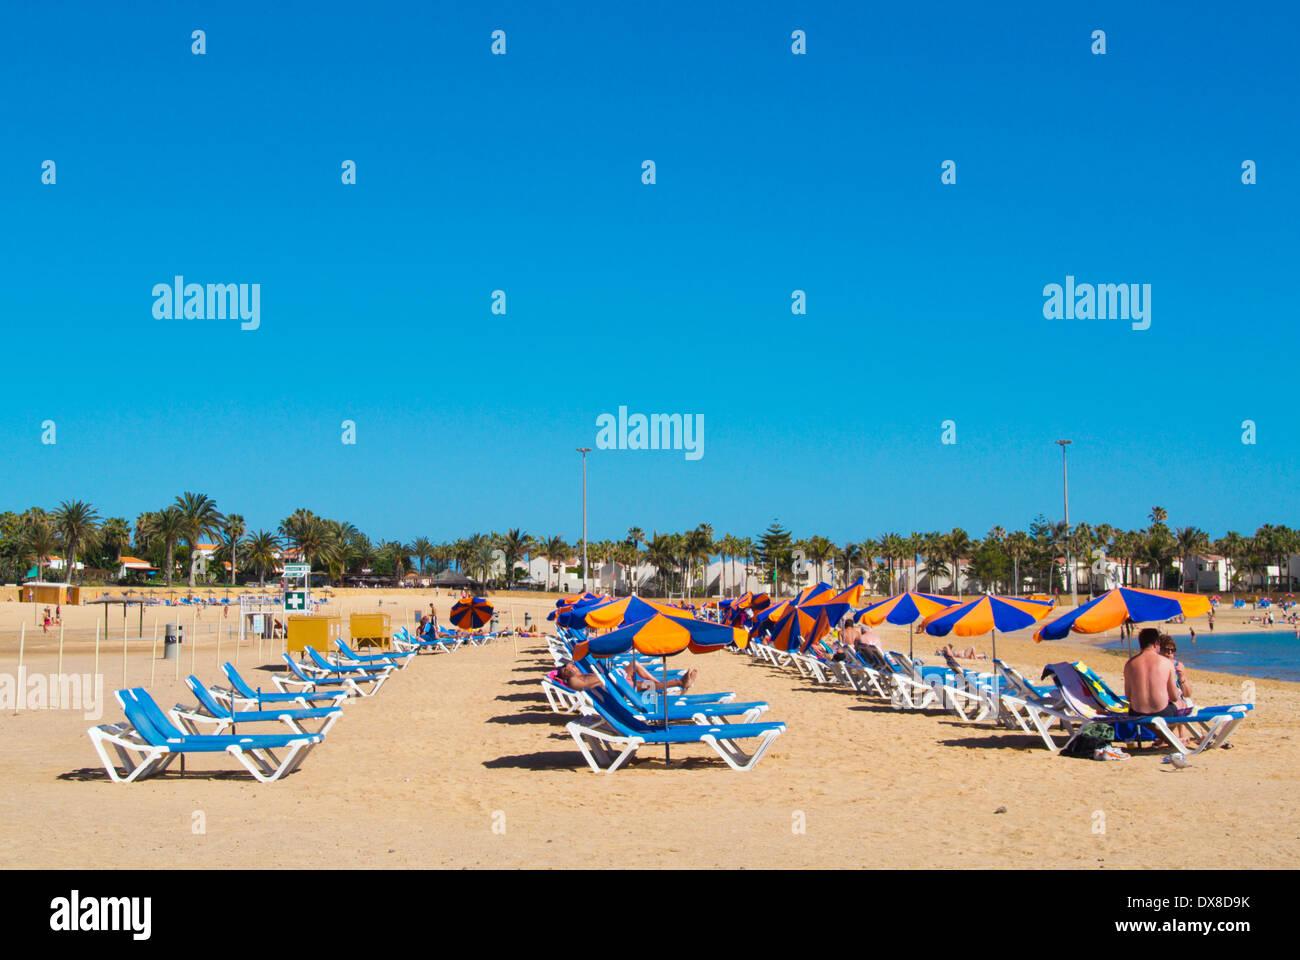 La Playa el Castilo main beach, Caleta de Fuste, Fuerteventura, Canary Islands, Spain, Europe - Stock Image